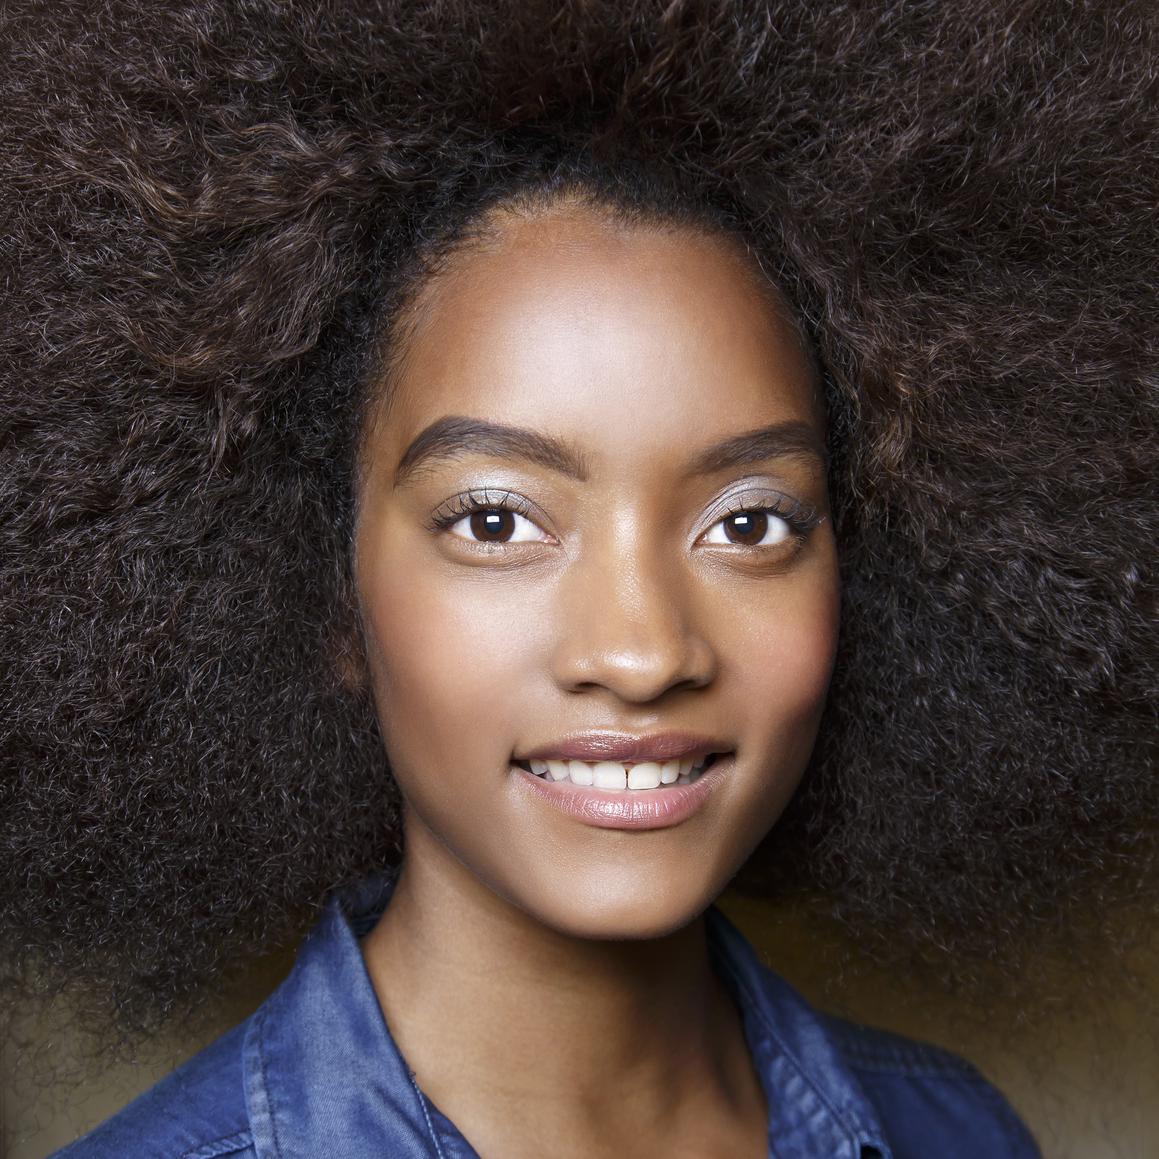 coiffure express des id es de coiffures express au quotidien elle. Black Bedroom Furniture Sets. Home Design Ideas